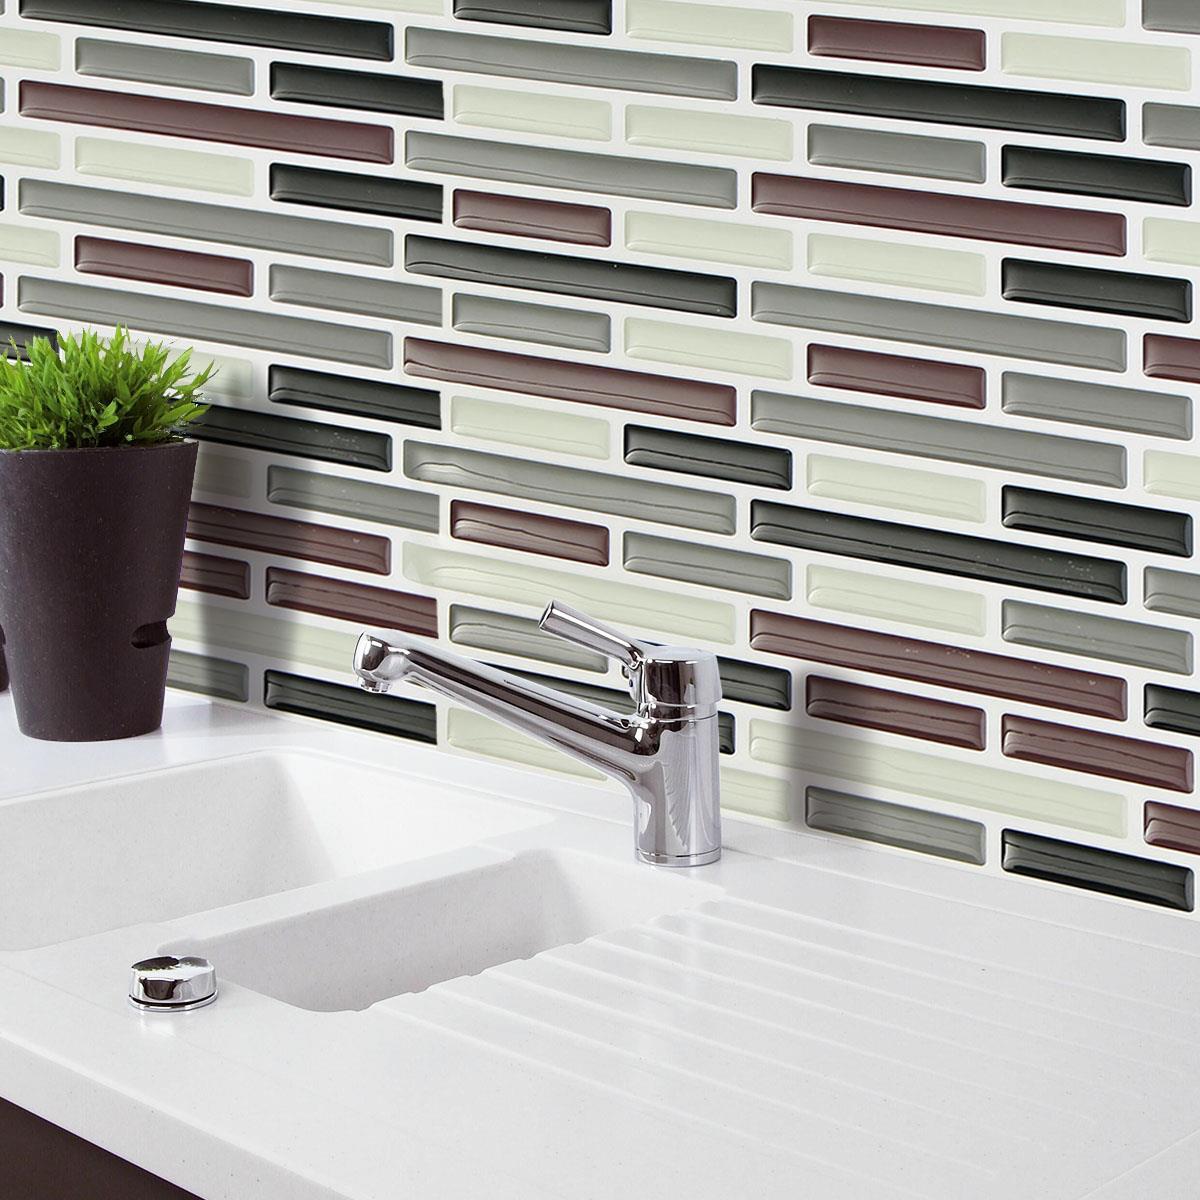 Buy Bathroom Wallpaper Cheap - Bathroom wallpaper for wall